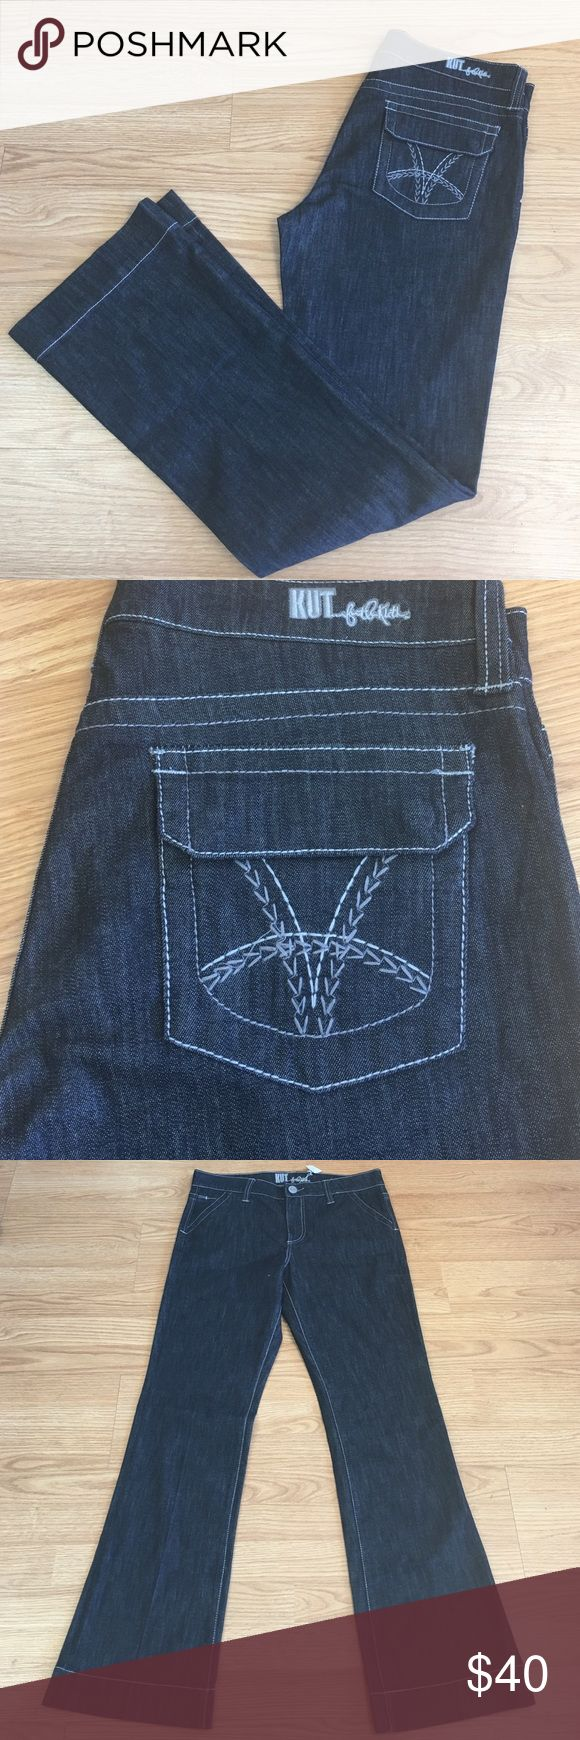 Kut denim jeans Kut jeans, medium rise, dark wash, size 10, five pocket, 34 inch inseam Kut from the Kloth Jeans Flare & Wide Leg